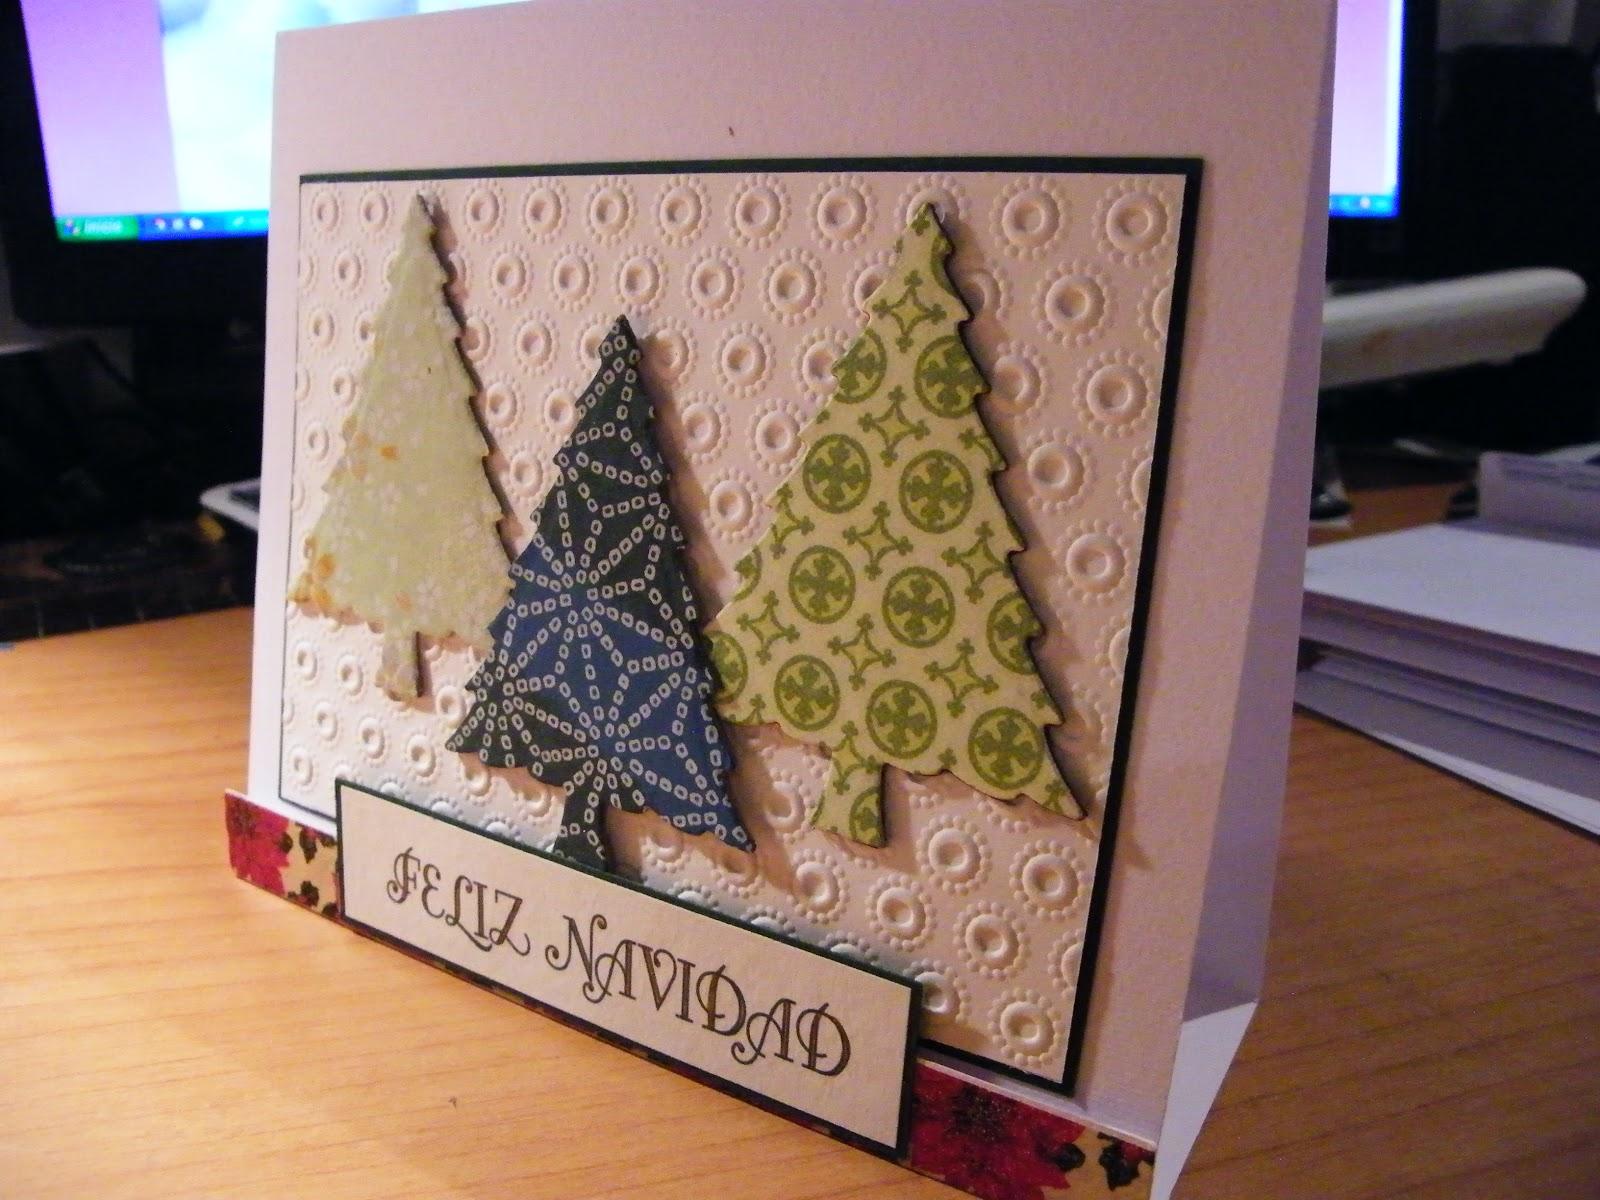 94bfdbe7d006 Learn These Modelos Tarjetas De Navidad Hechas A Mano {Swypeout}